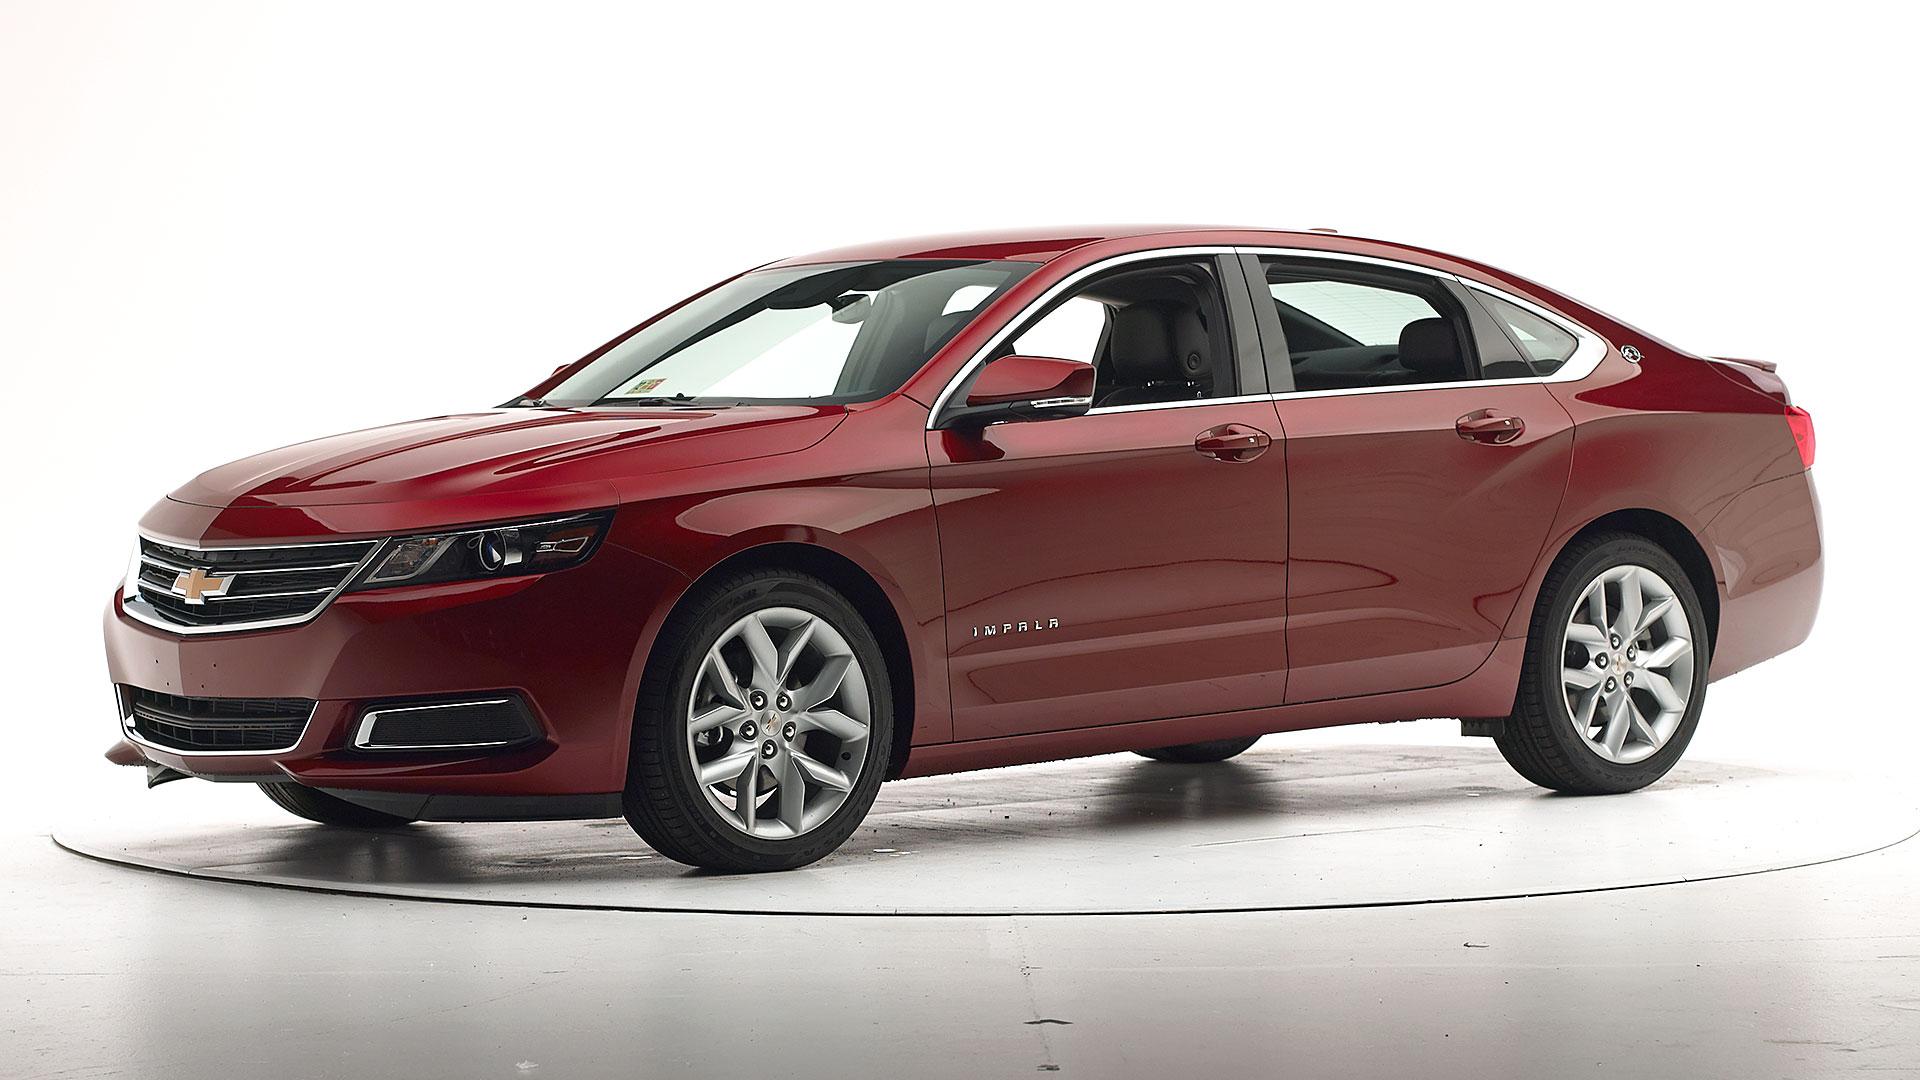 2017 Chevrolet Impala 4 Door Sedan